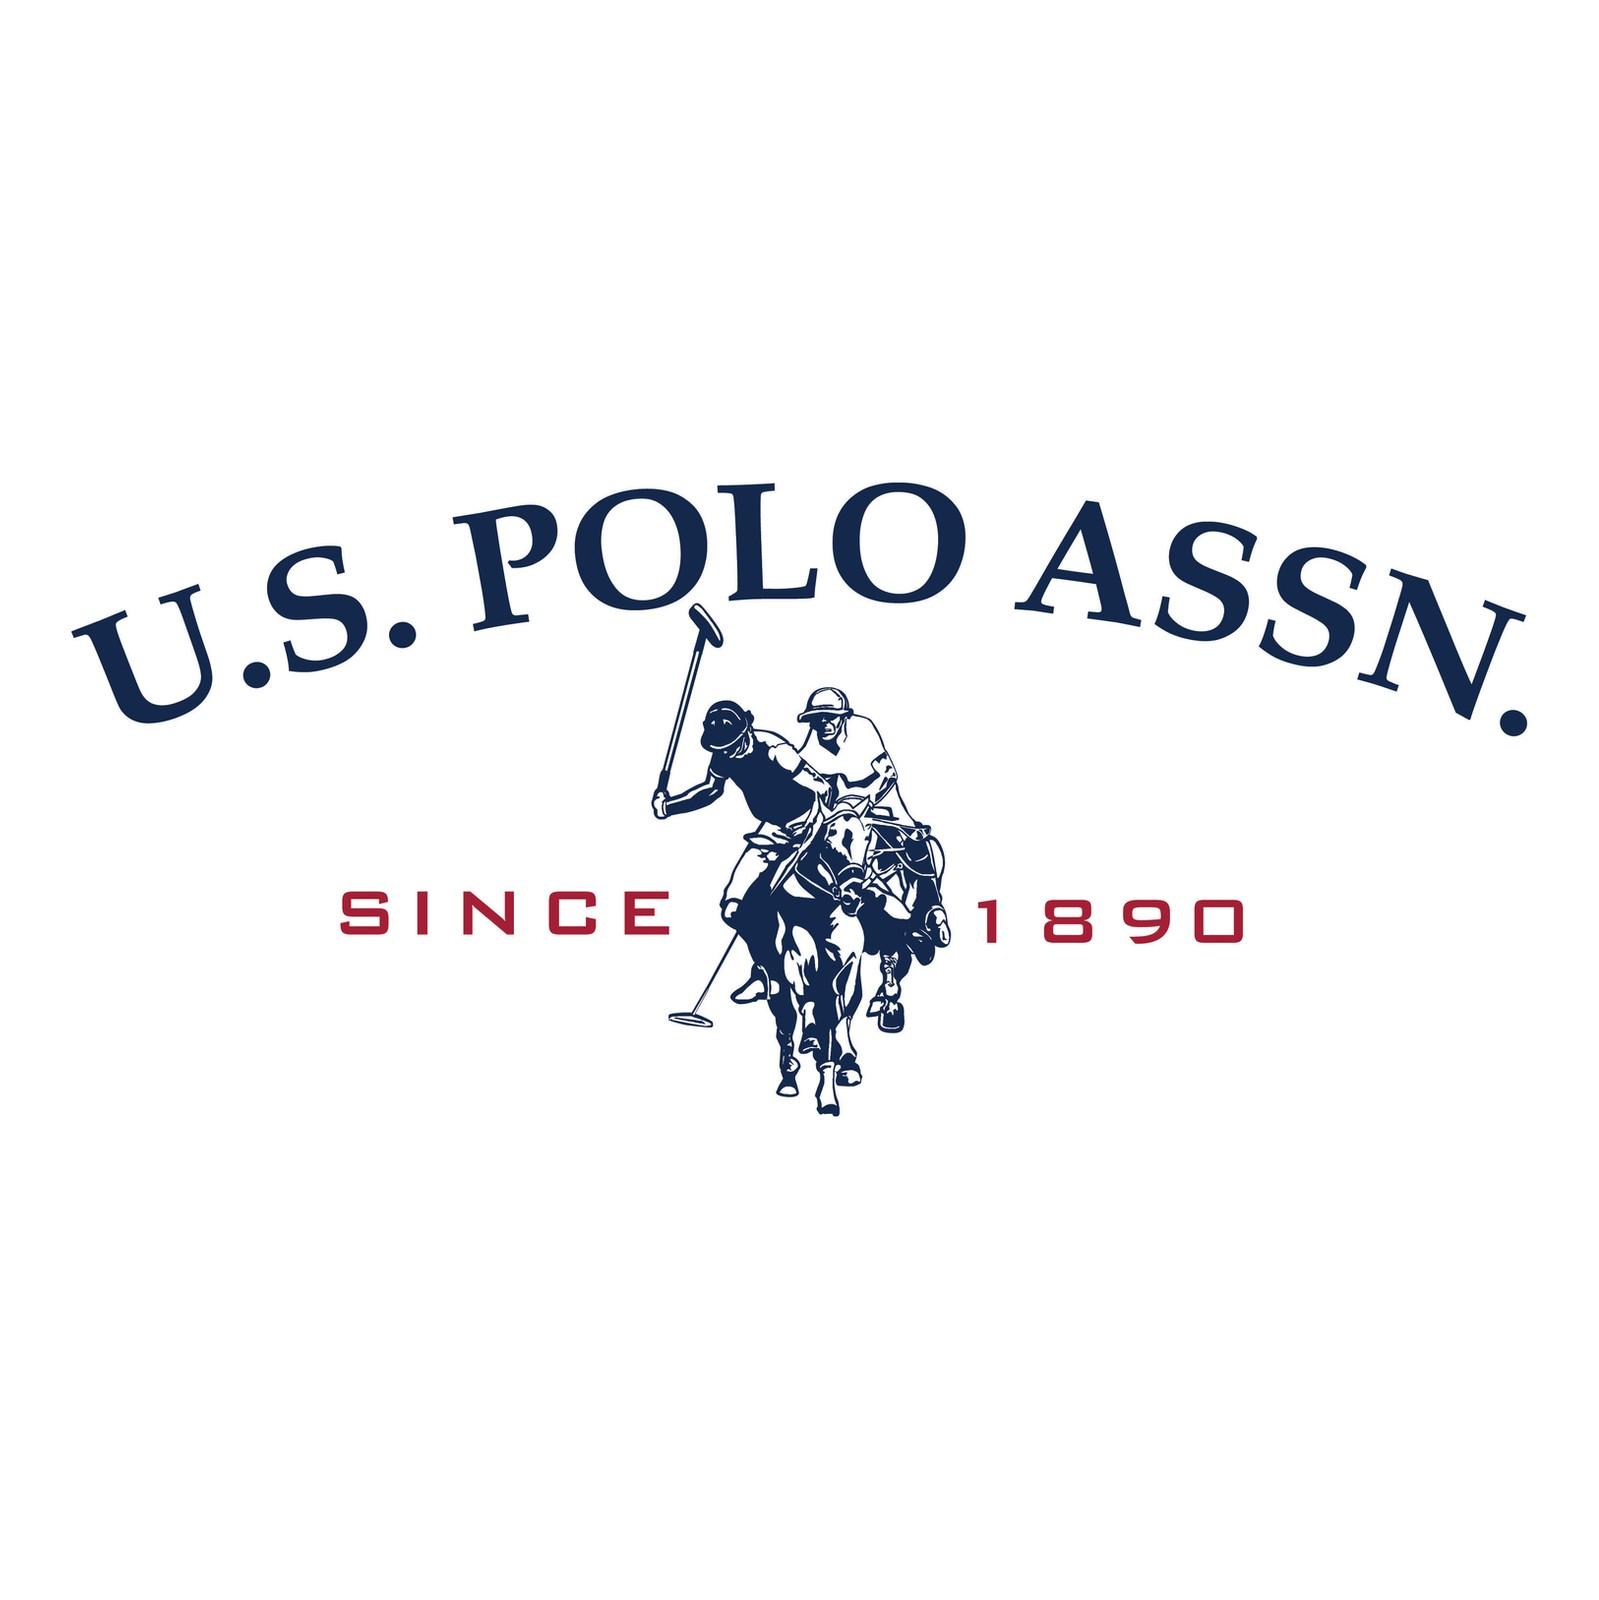 U.S. Polo Assn..